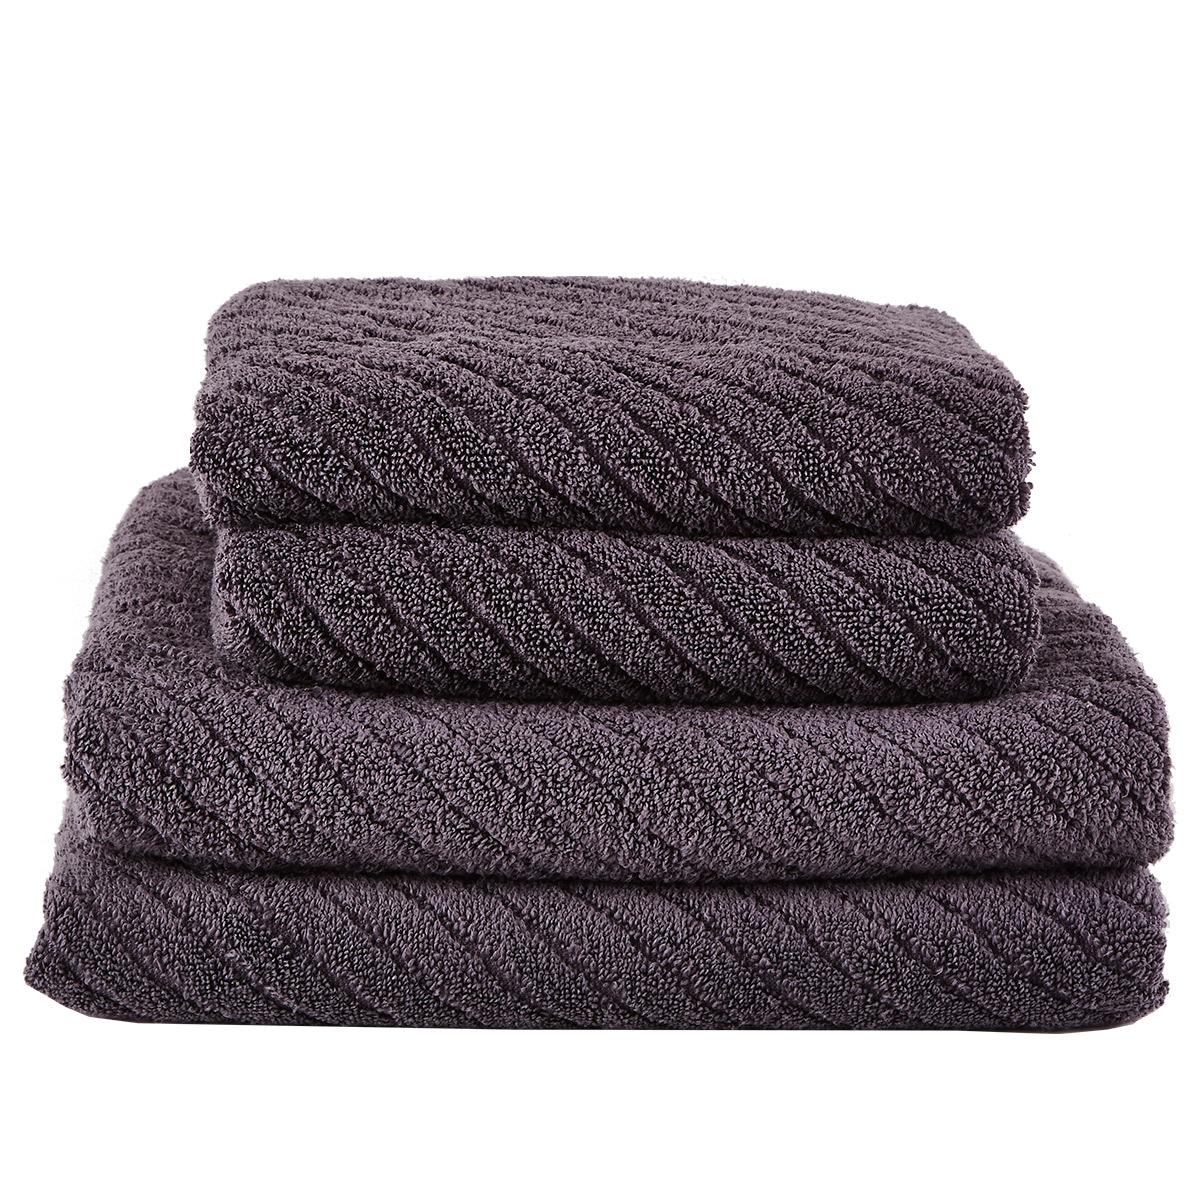 Zone håndklæder - Anthracite